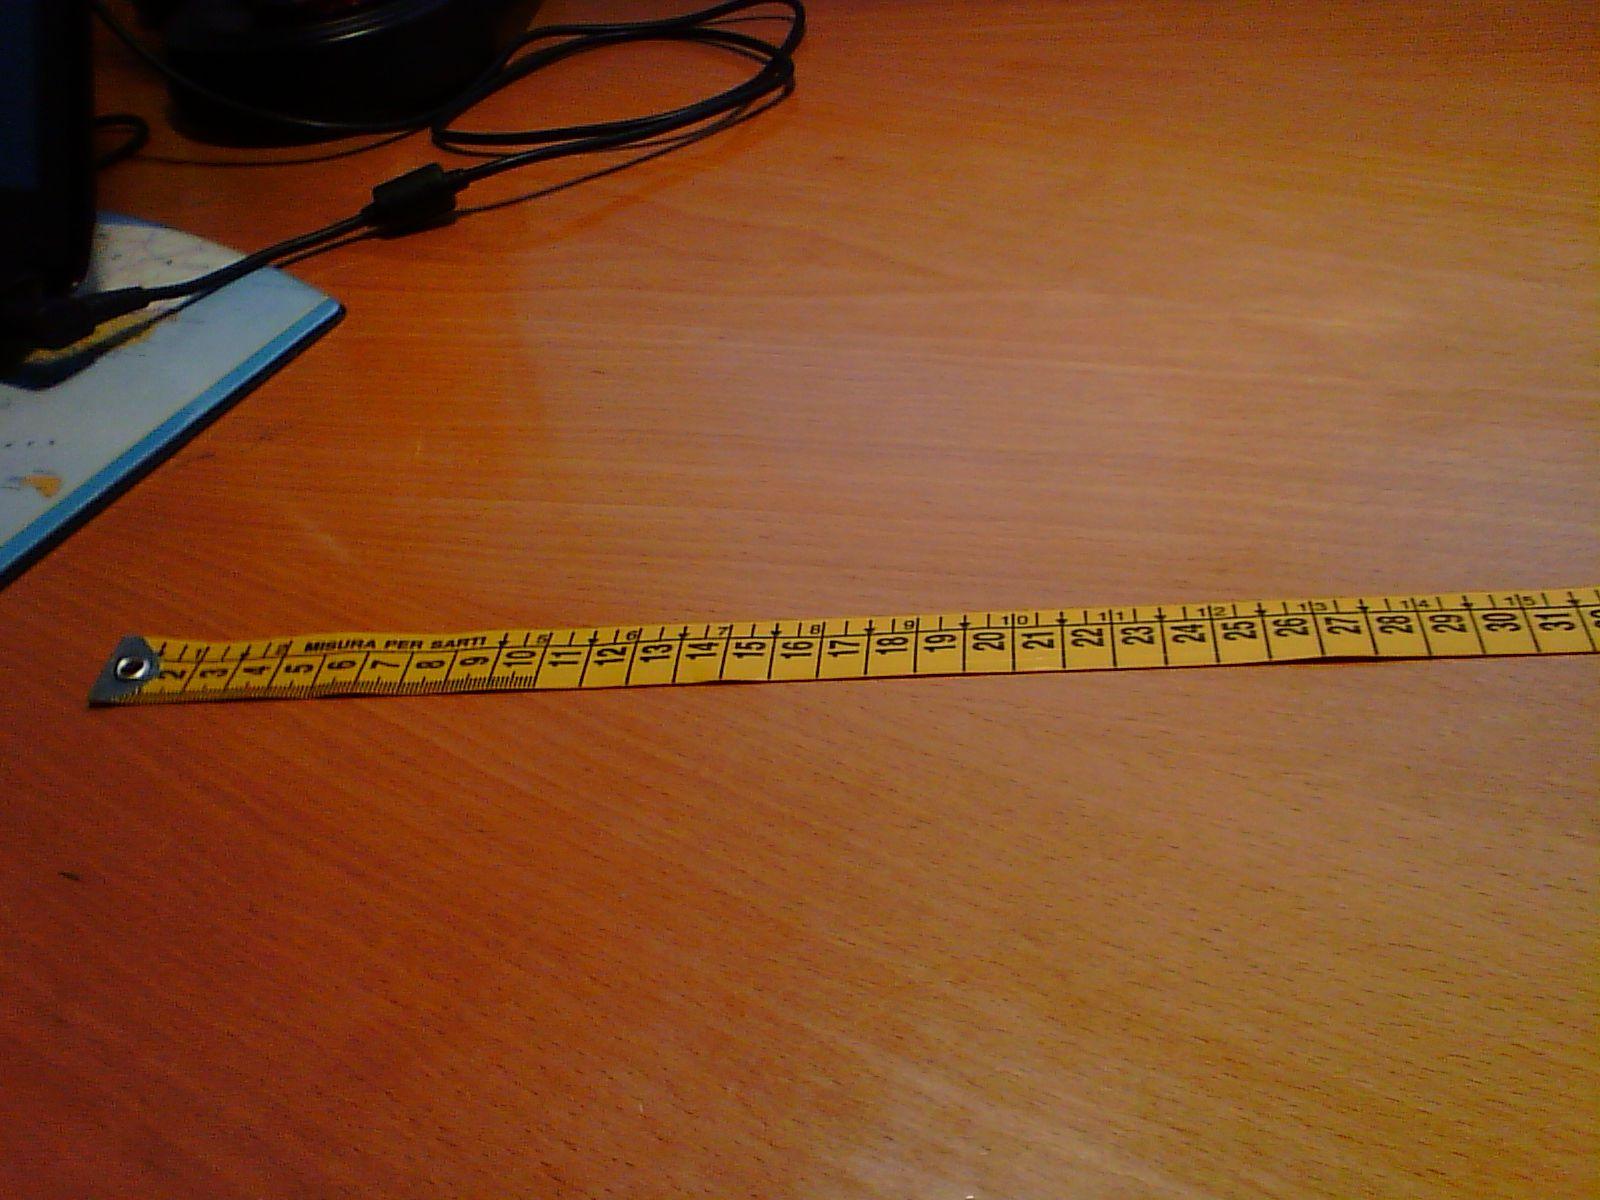 Sirve para medir la longitud